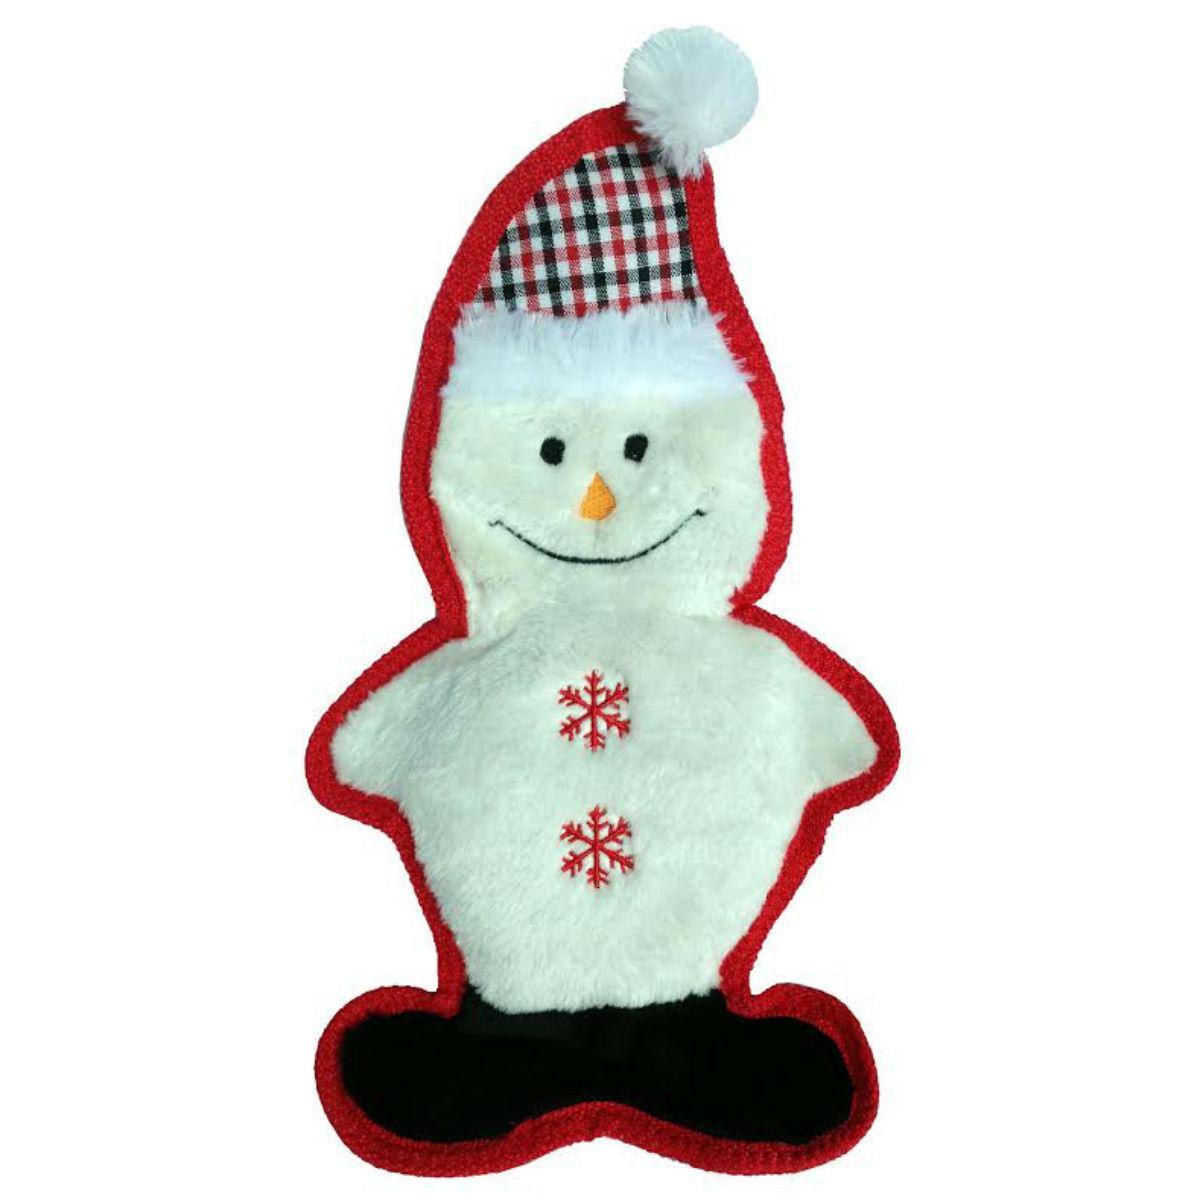 PetLou Christmas Bite Me Plaid Dog Toy - Snowman